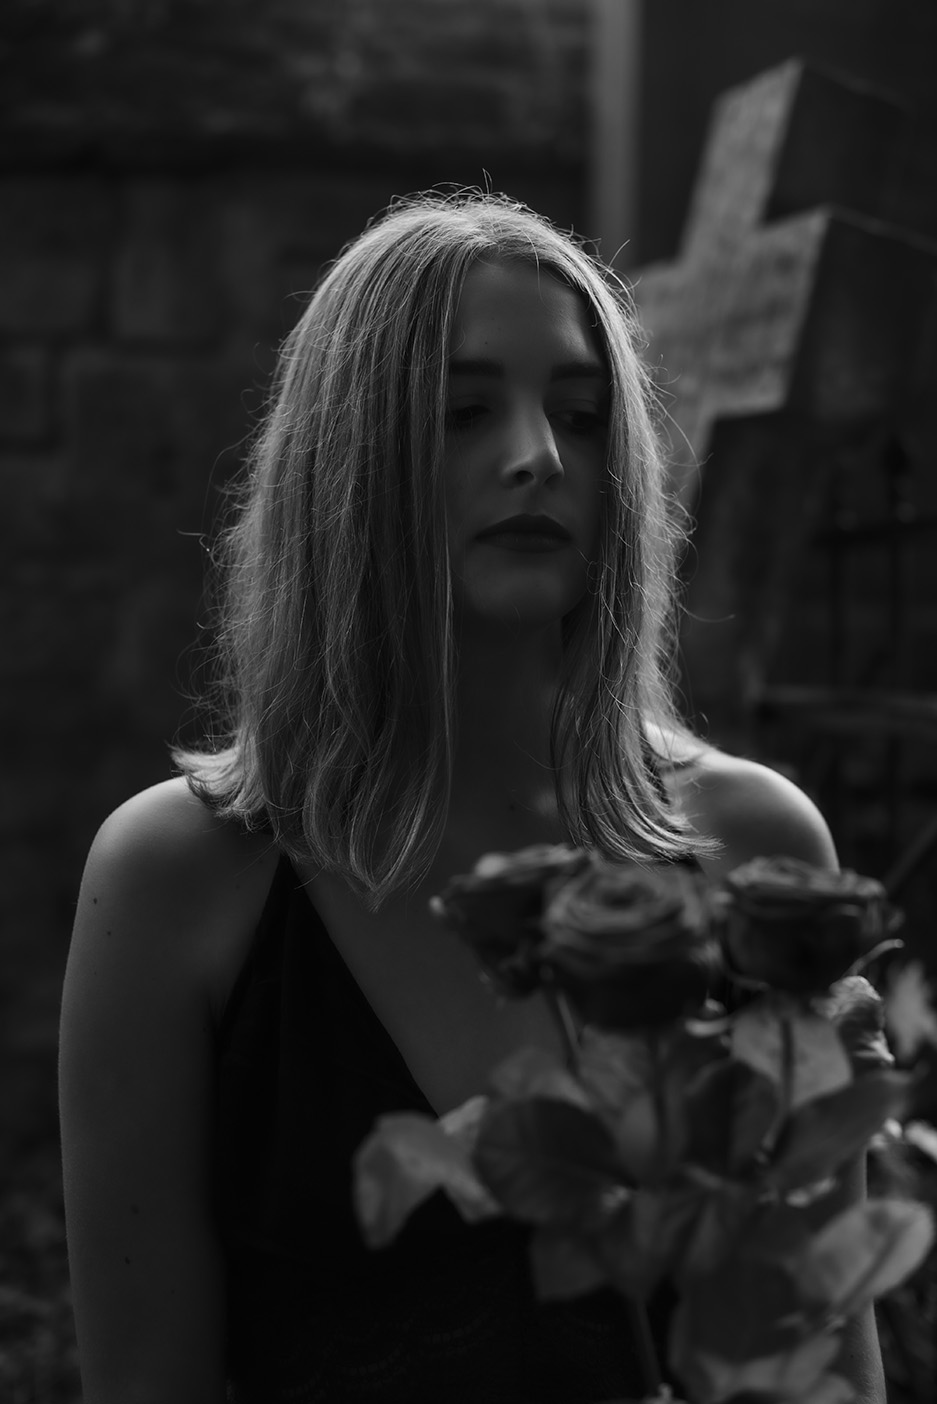 Contemplation - Caen 2019